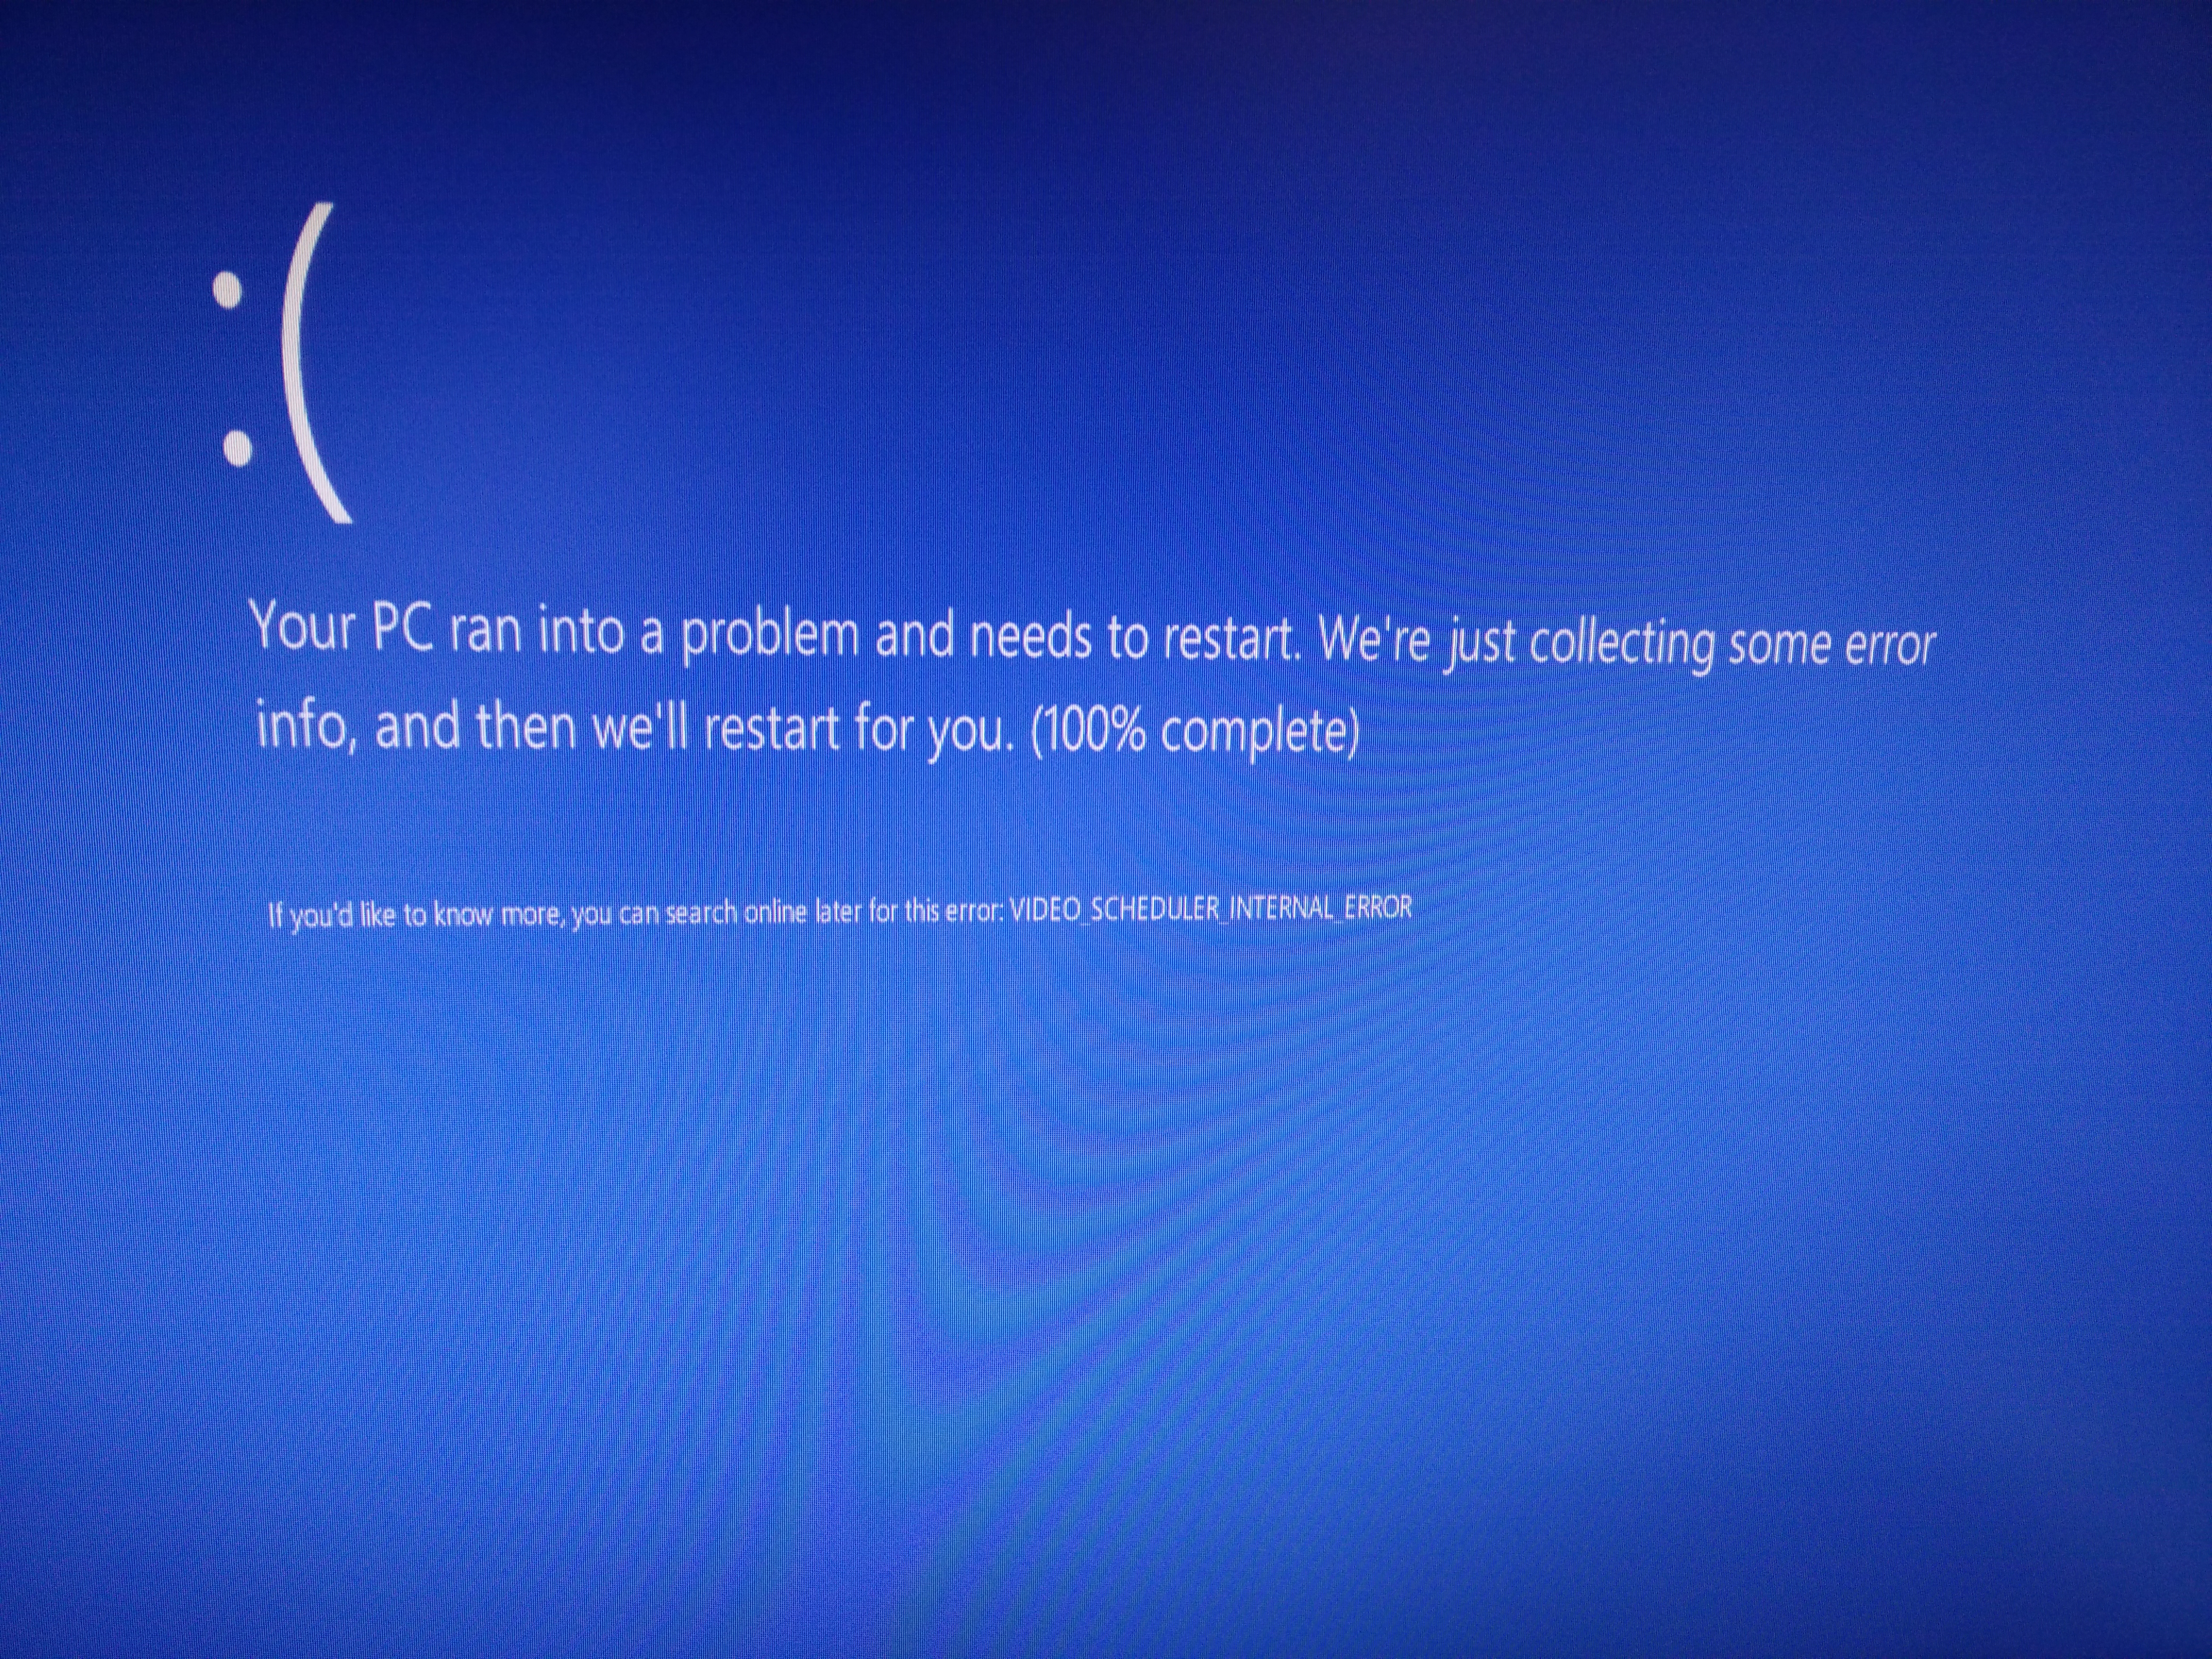 Nvidia windows 10 problems - Attachments